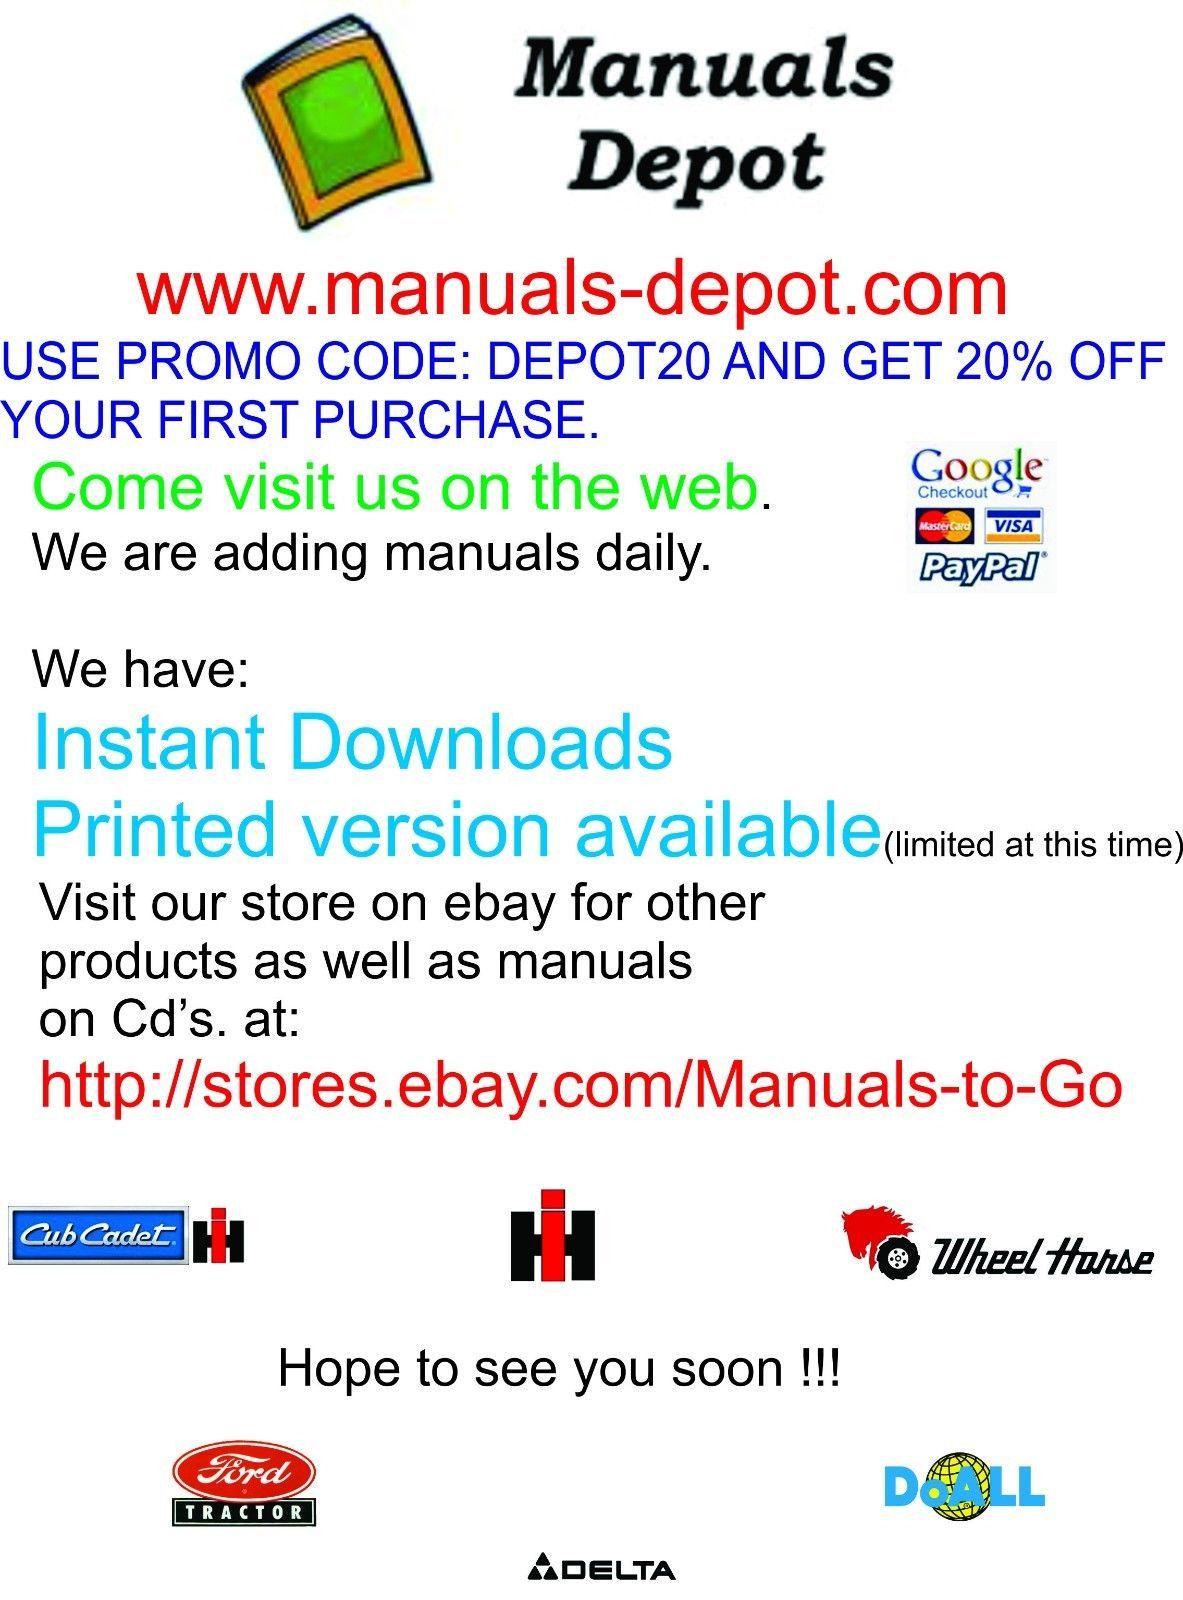 Cub Cadet International Farmall  Manuals COMBO Package